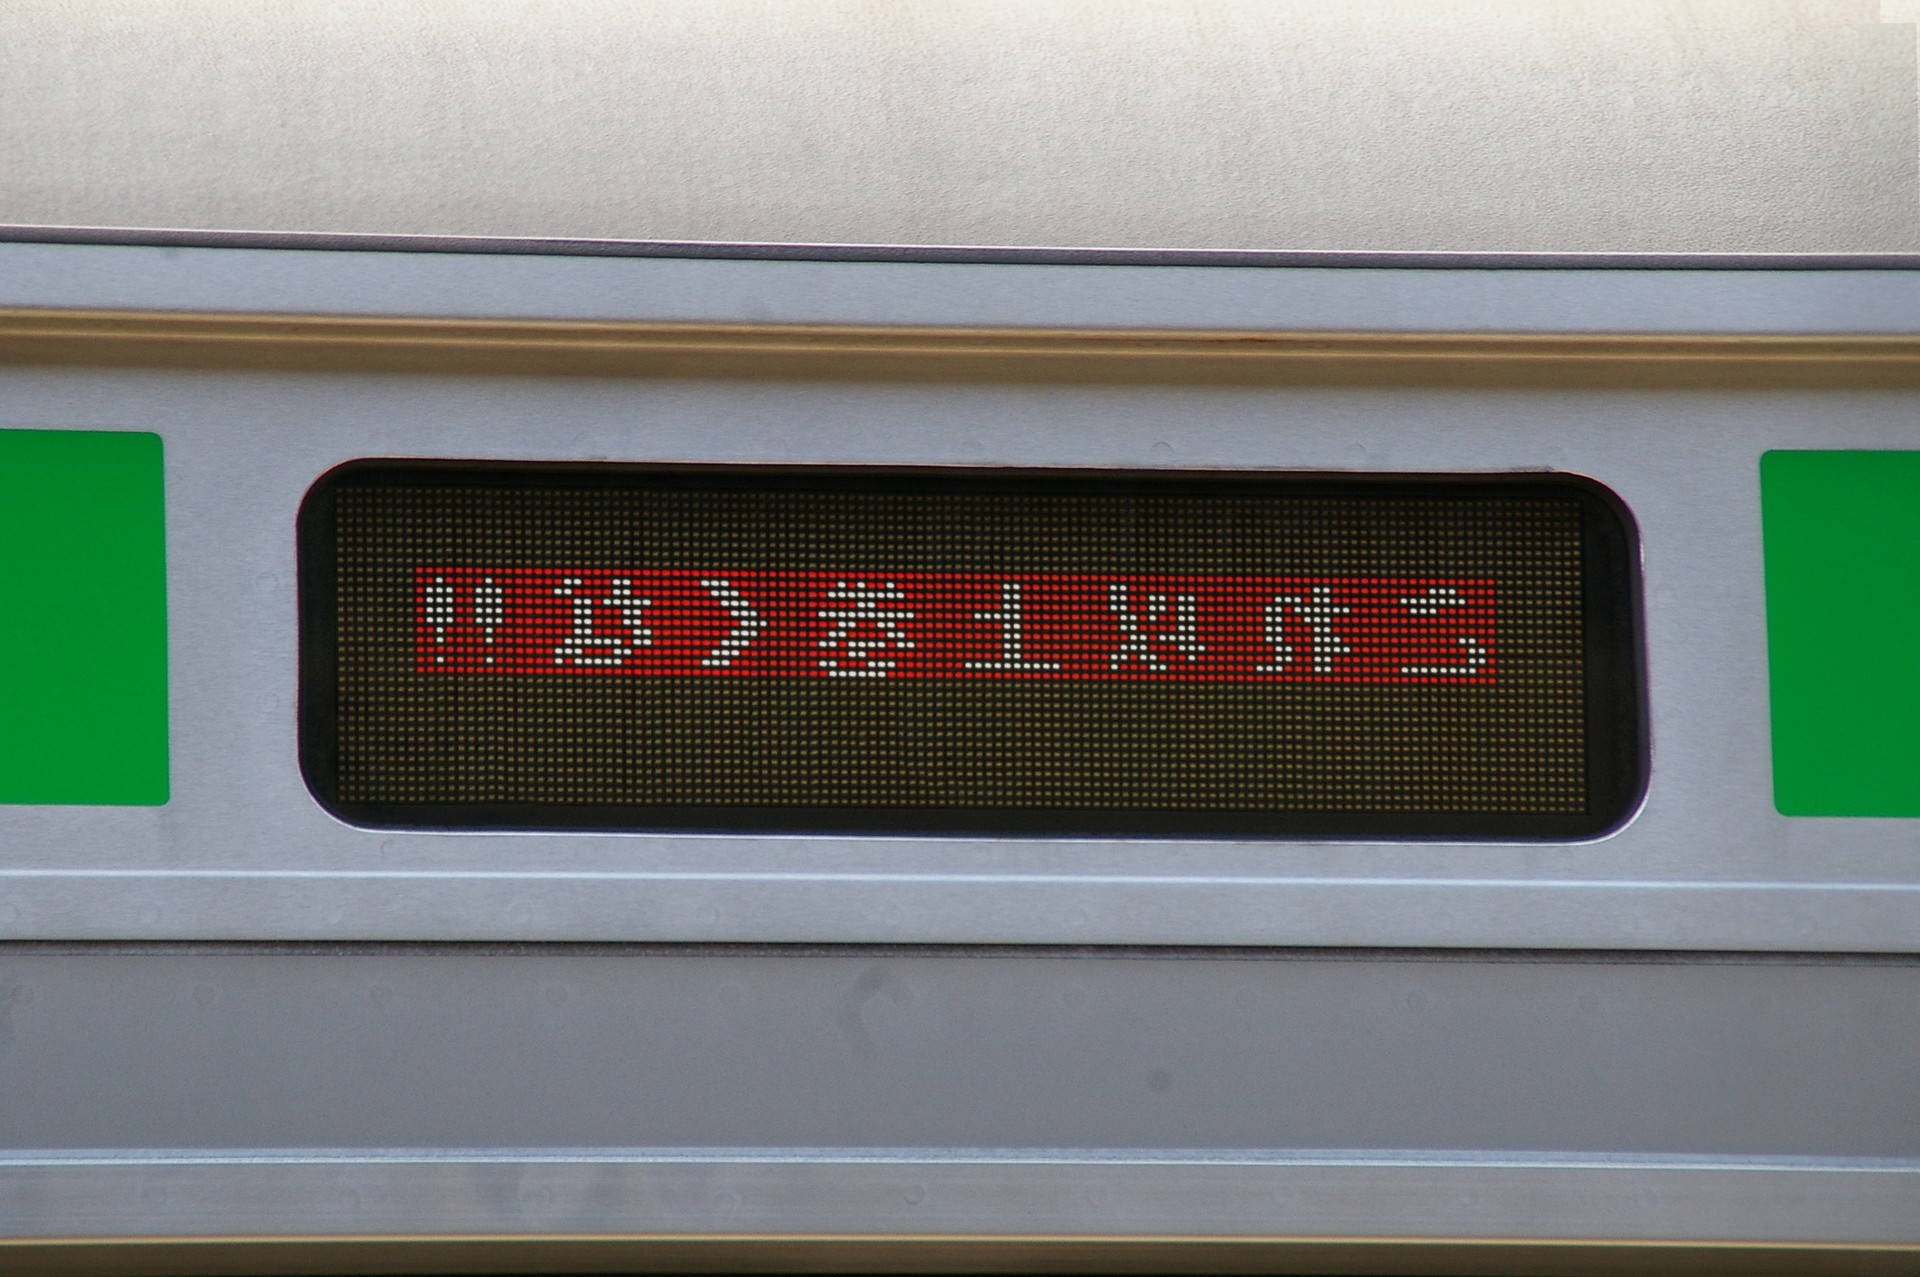 E233系のこれ以上巻くな!!LED表示(ウソ電)